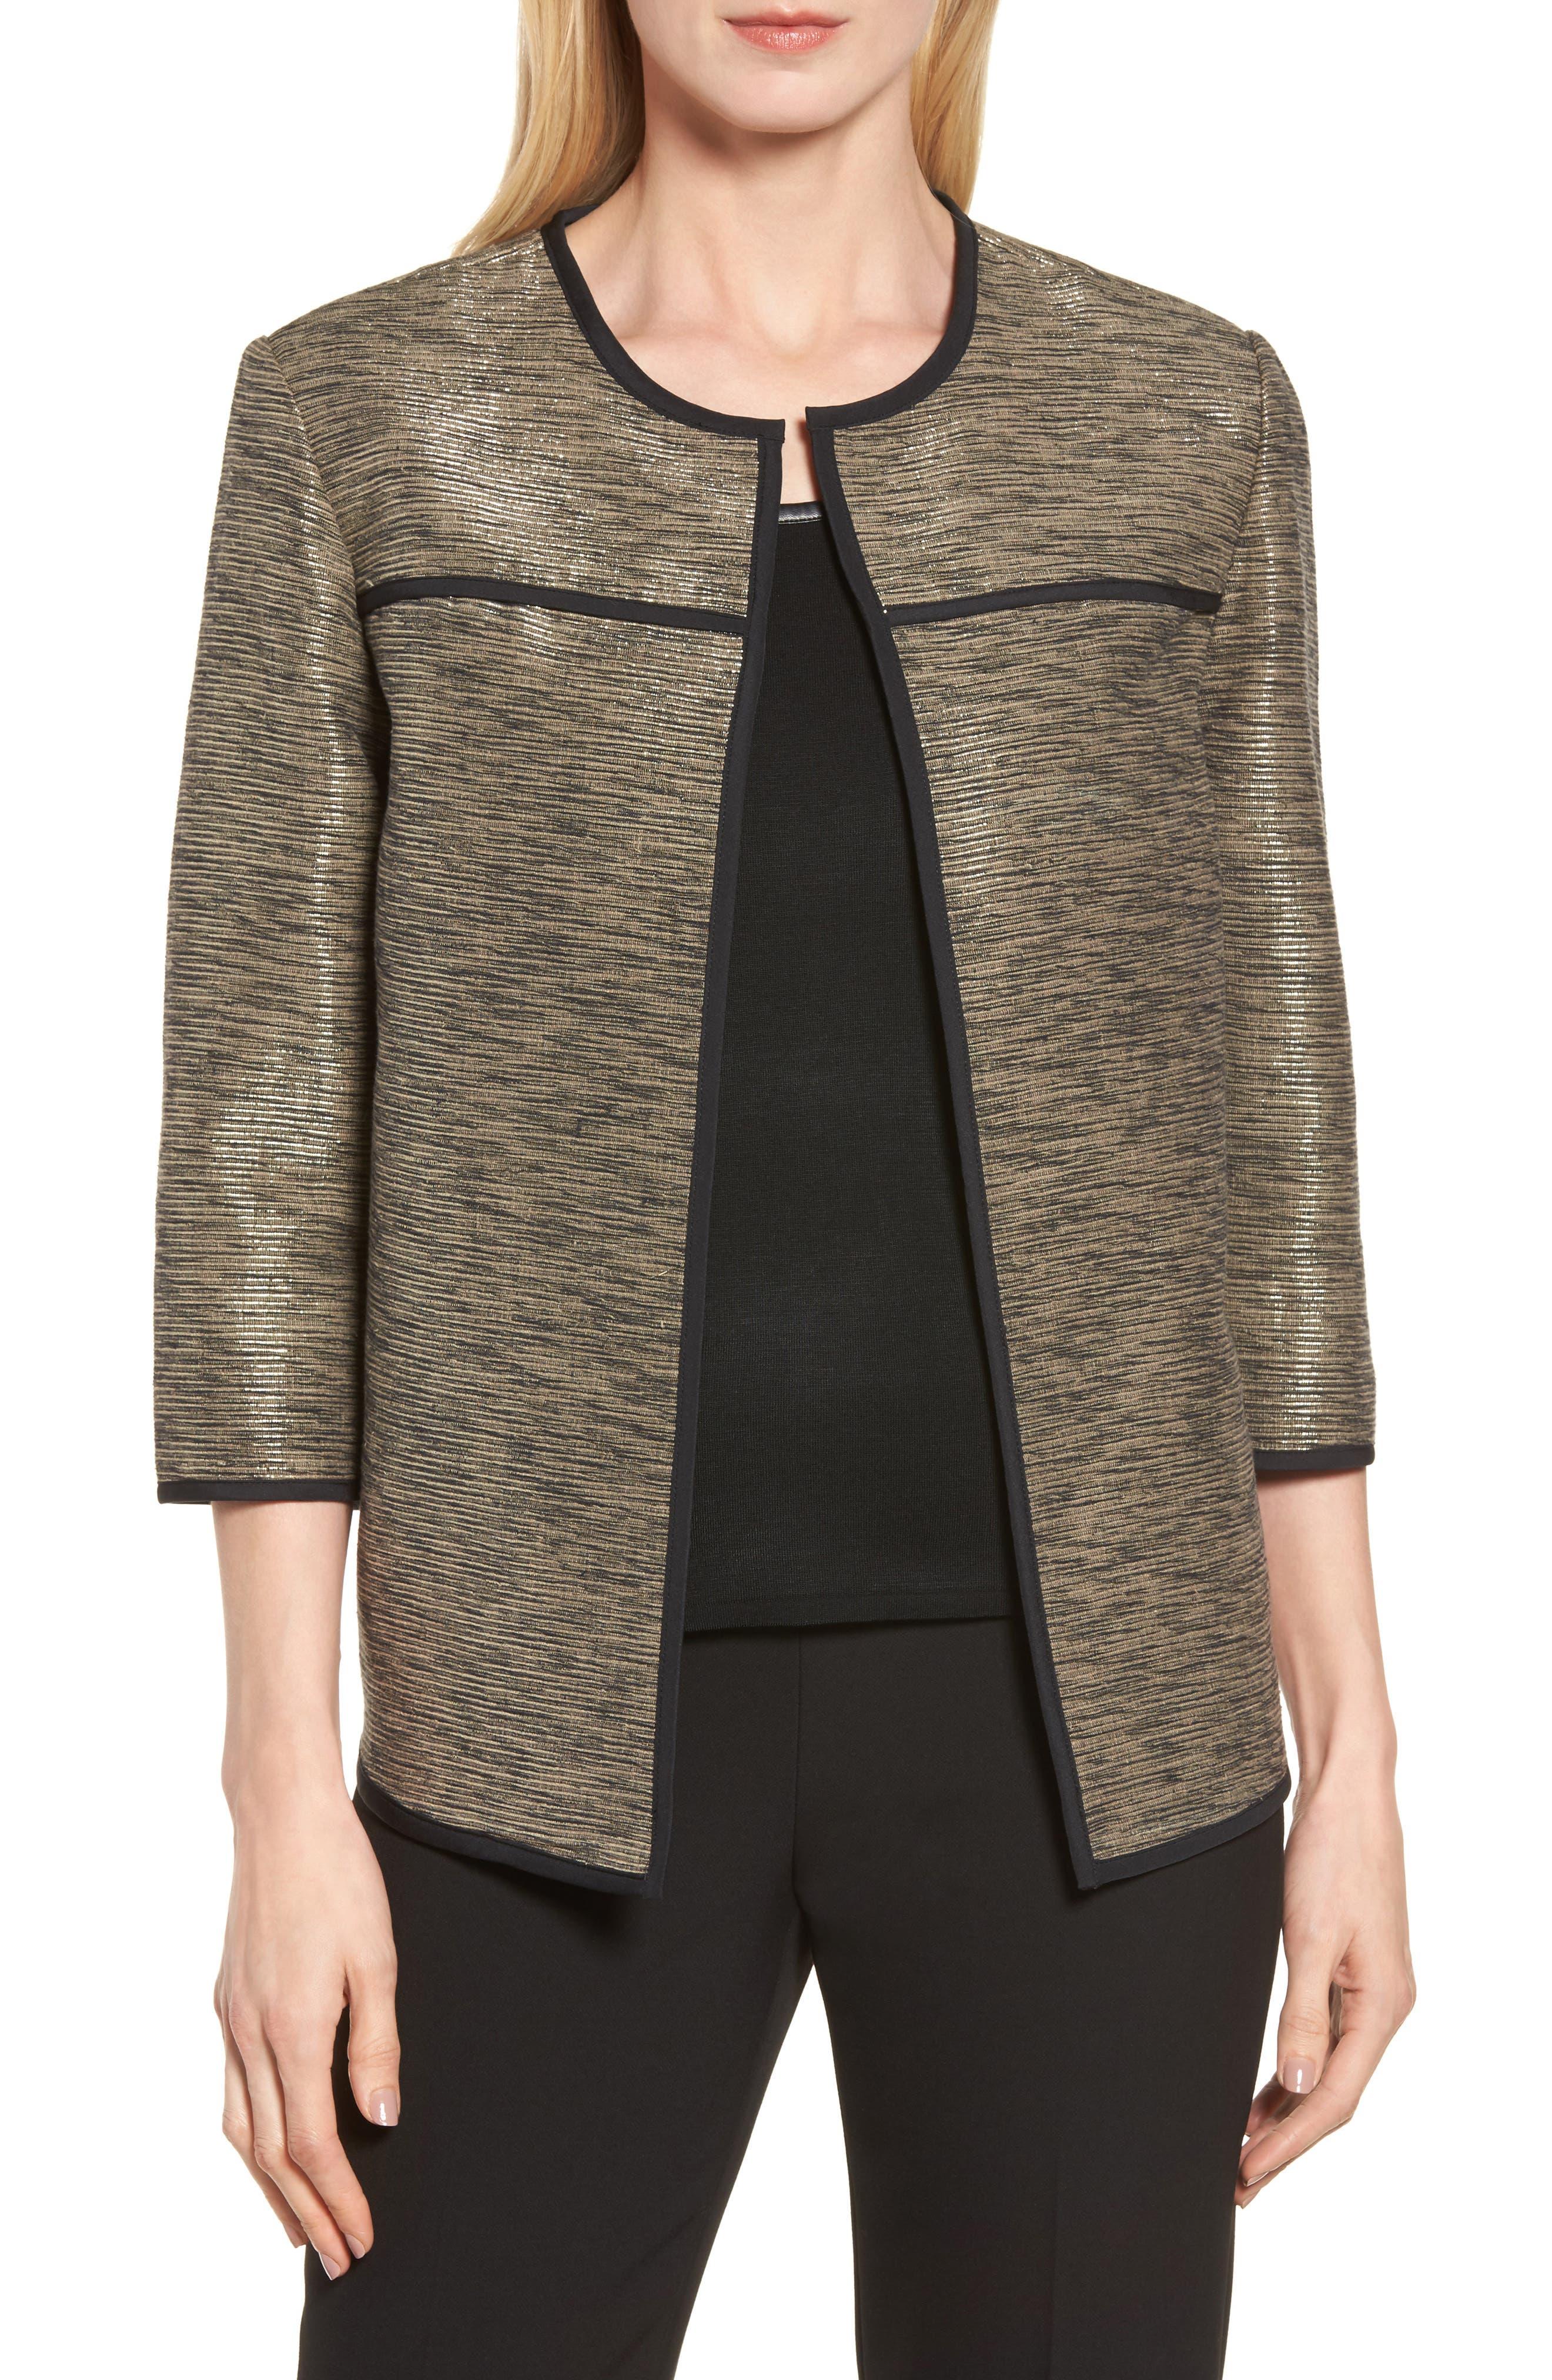 Metallic Tweed Jacket,                             Main thumbnail 1, color,                             Ash/ Black/ Cat Eye